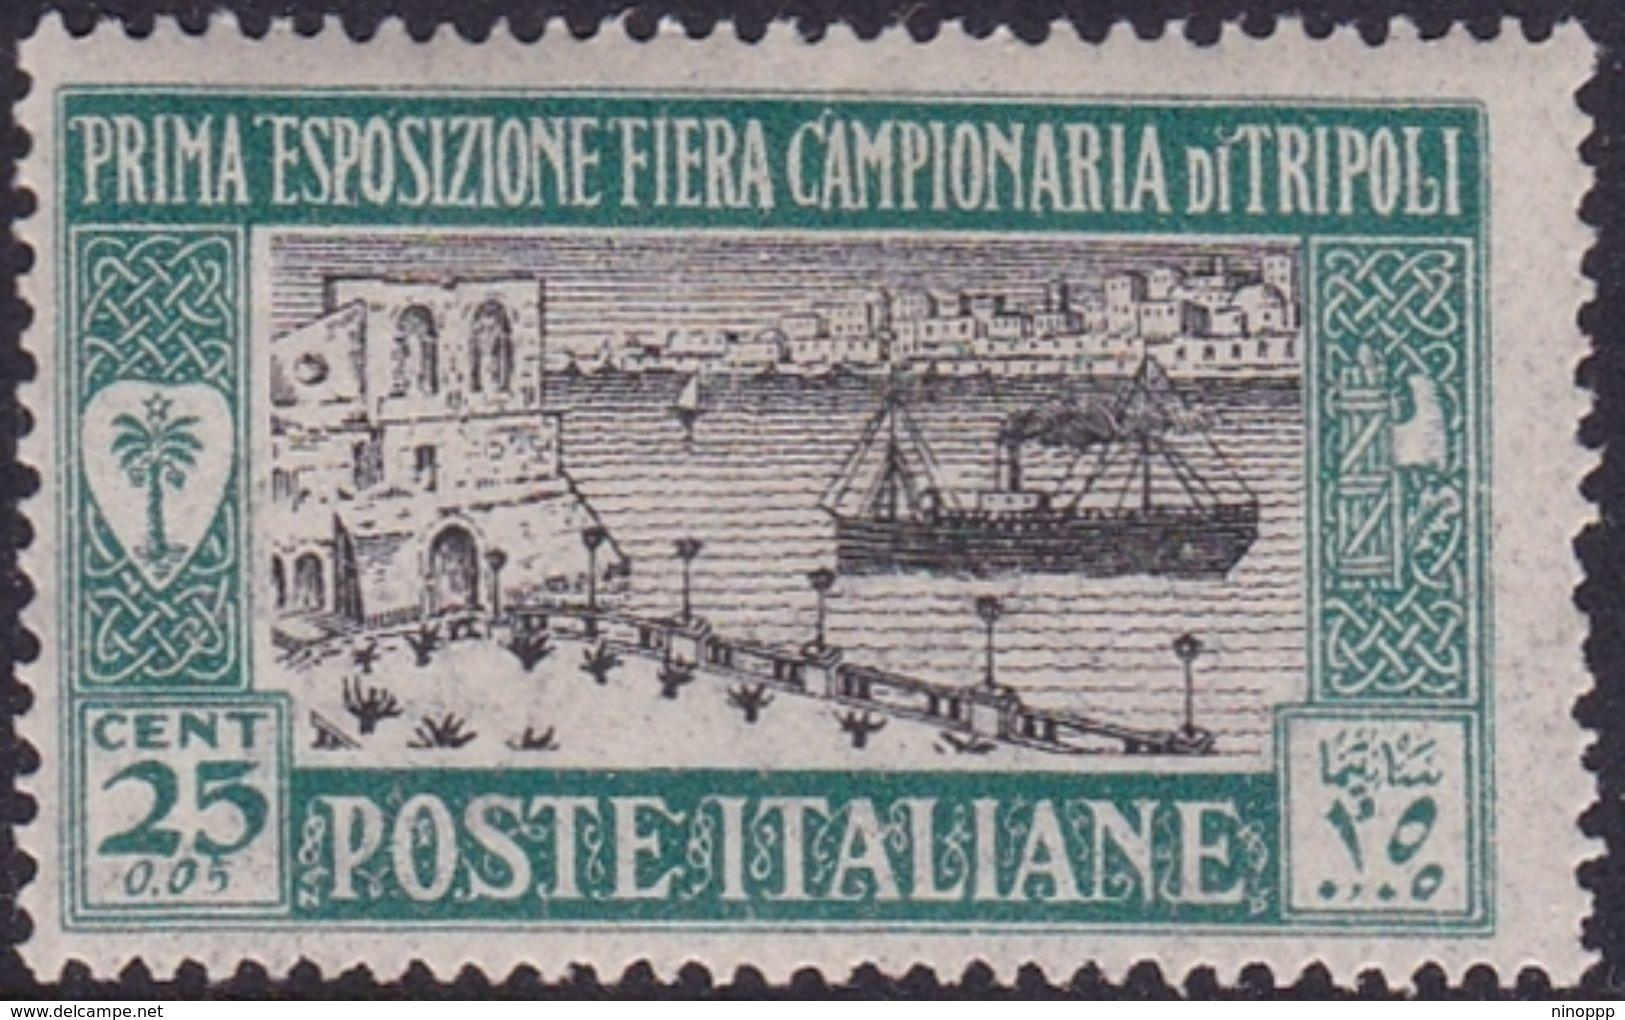 Italy-Colonies And Territories-Libya S 67 1927 1st Tripoli Fair,25c+5c Lilac,mint Hinged - Libya